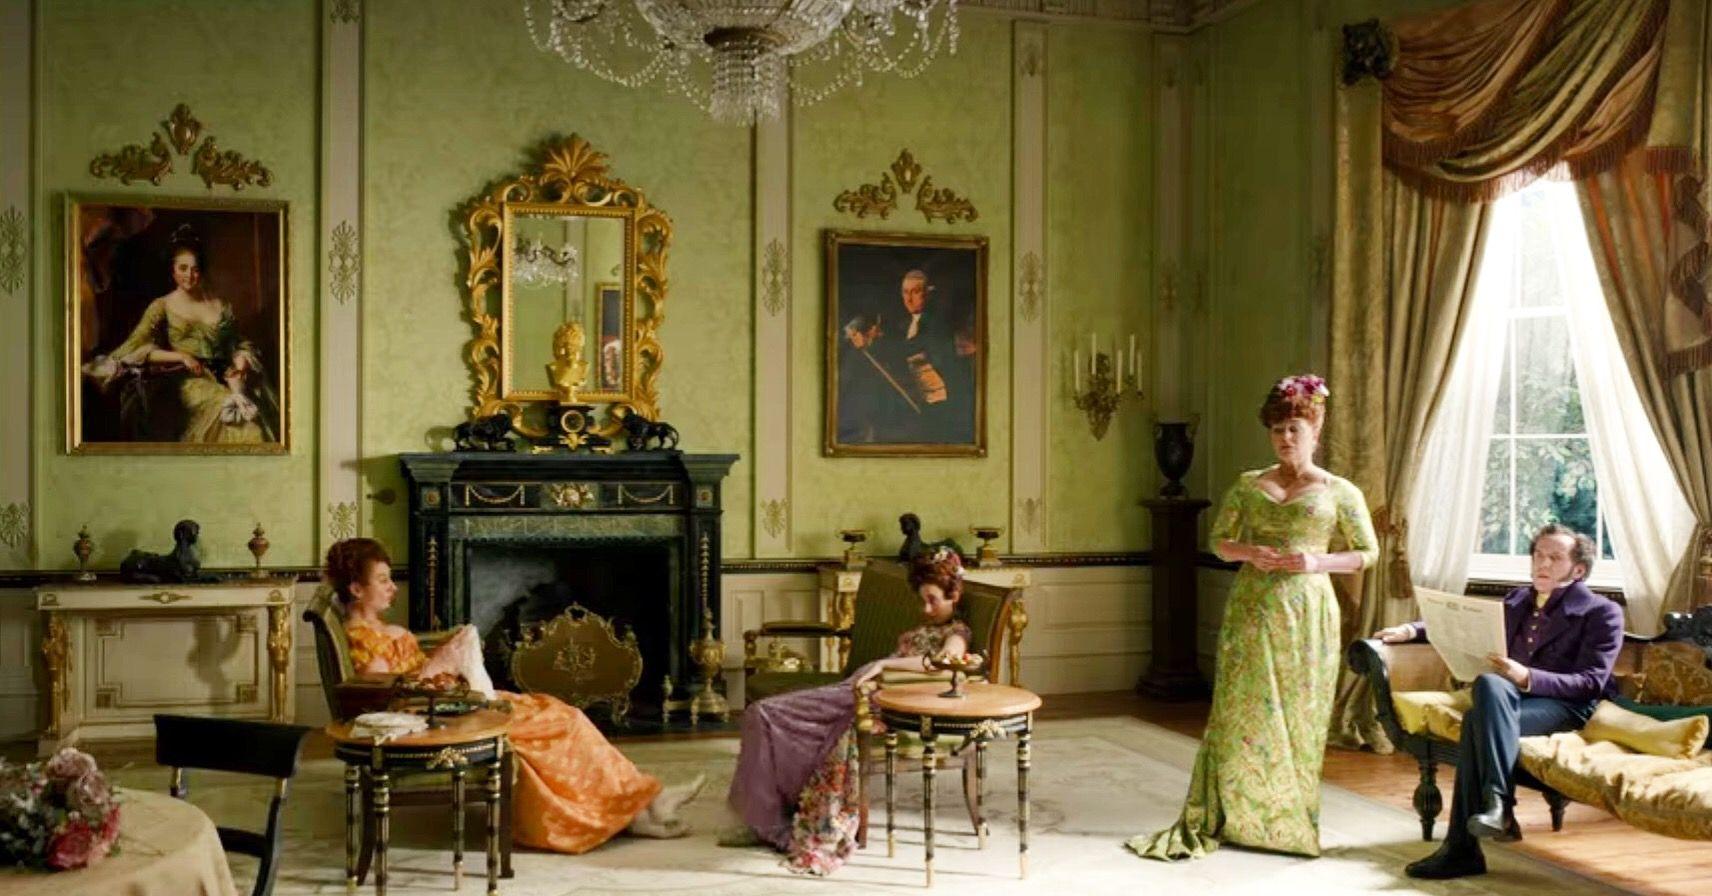 Netflix Bridgertin Featherington drawing room with green walls and Regency settees